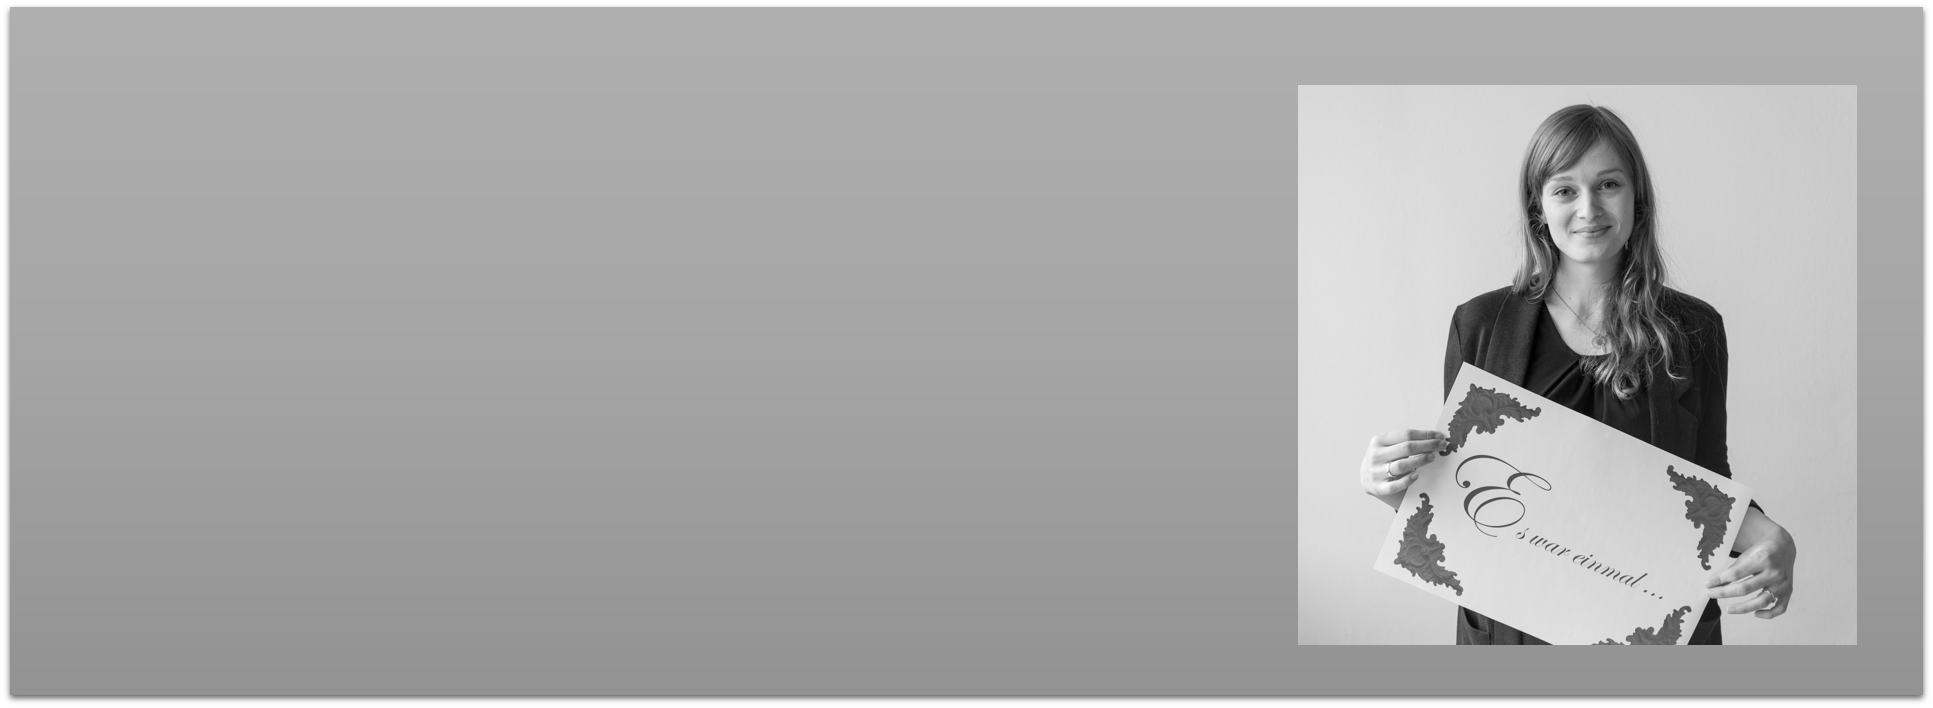 dennnis banner